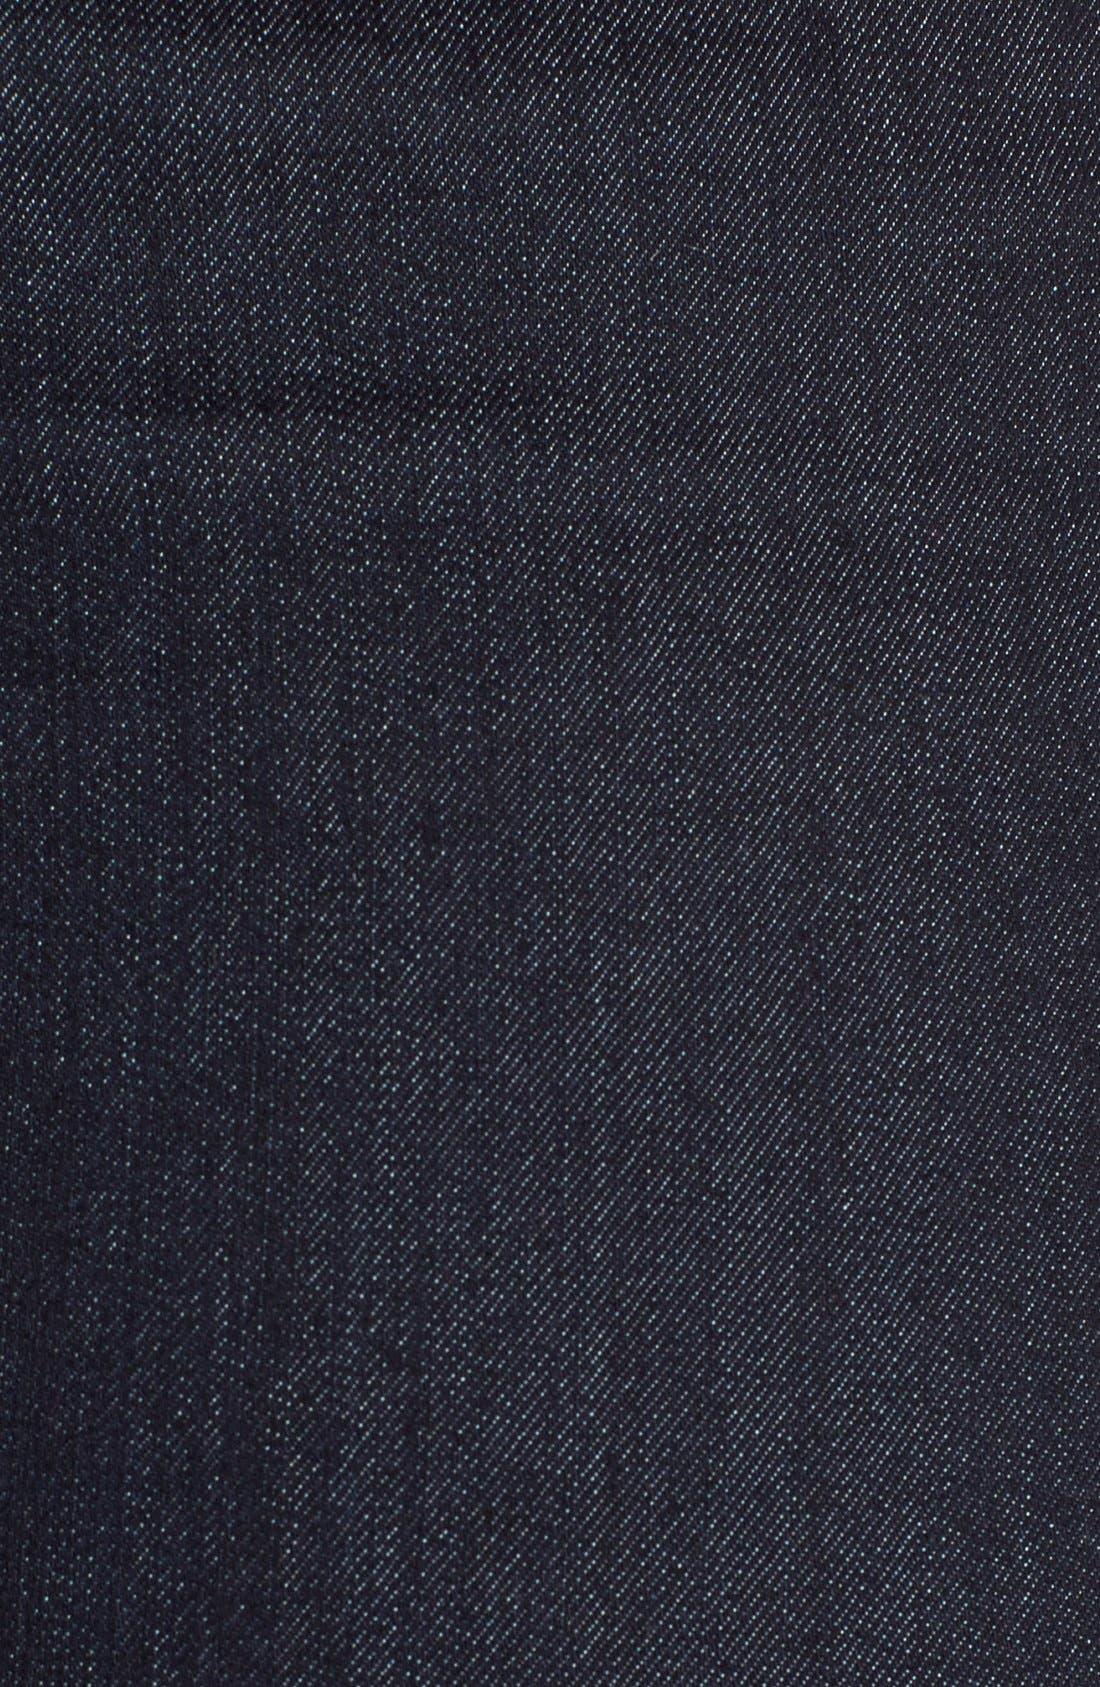 'Briella' Stretch Roll Cuff Denim Shorts,                             Alternate thumbnail 6, color,                             400